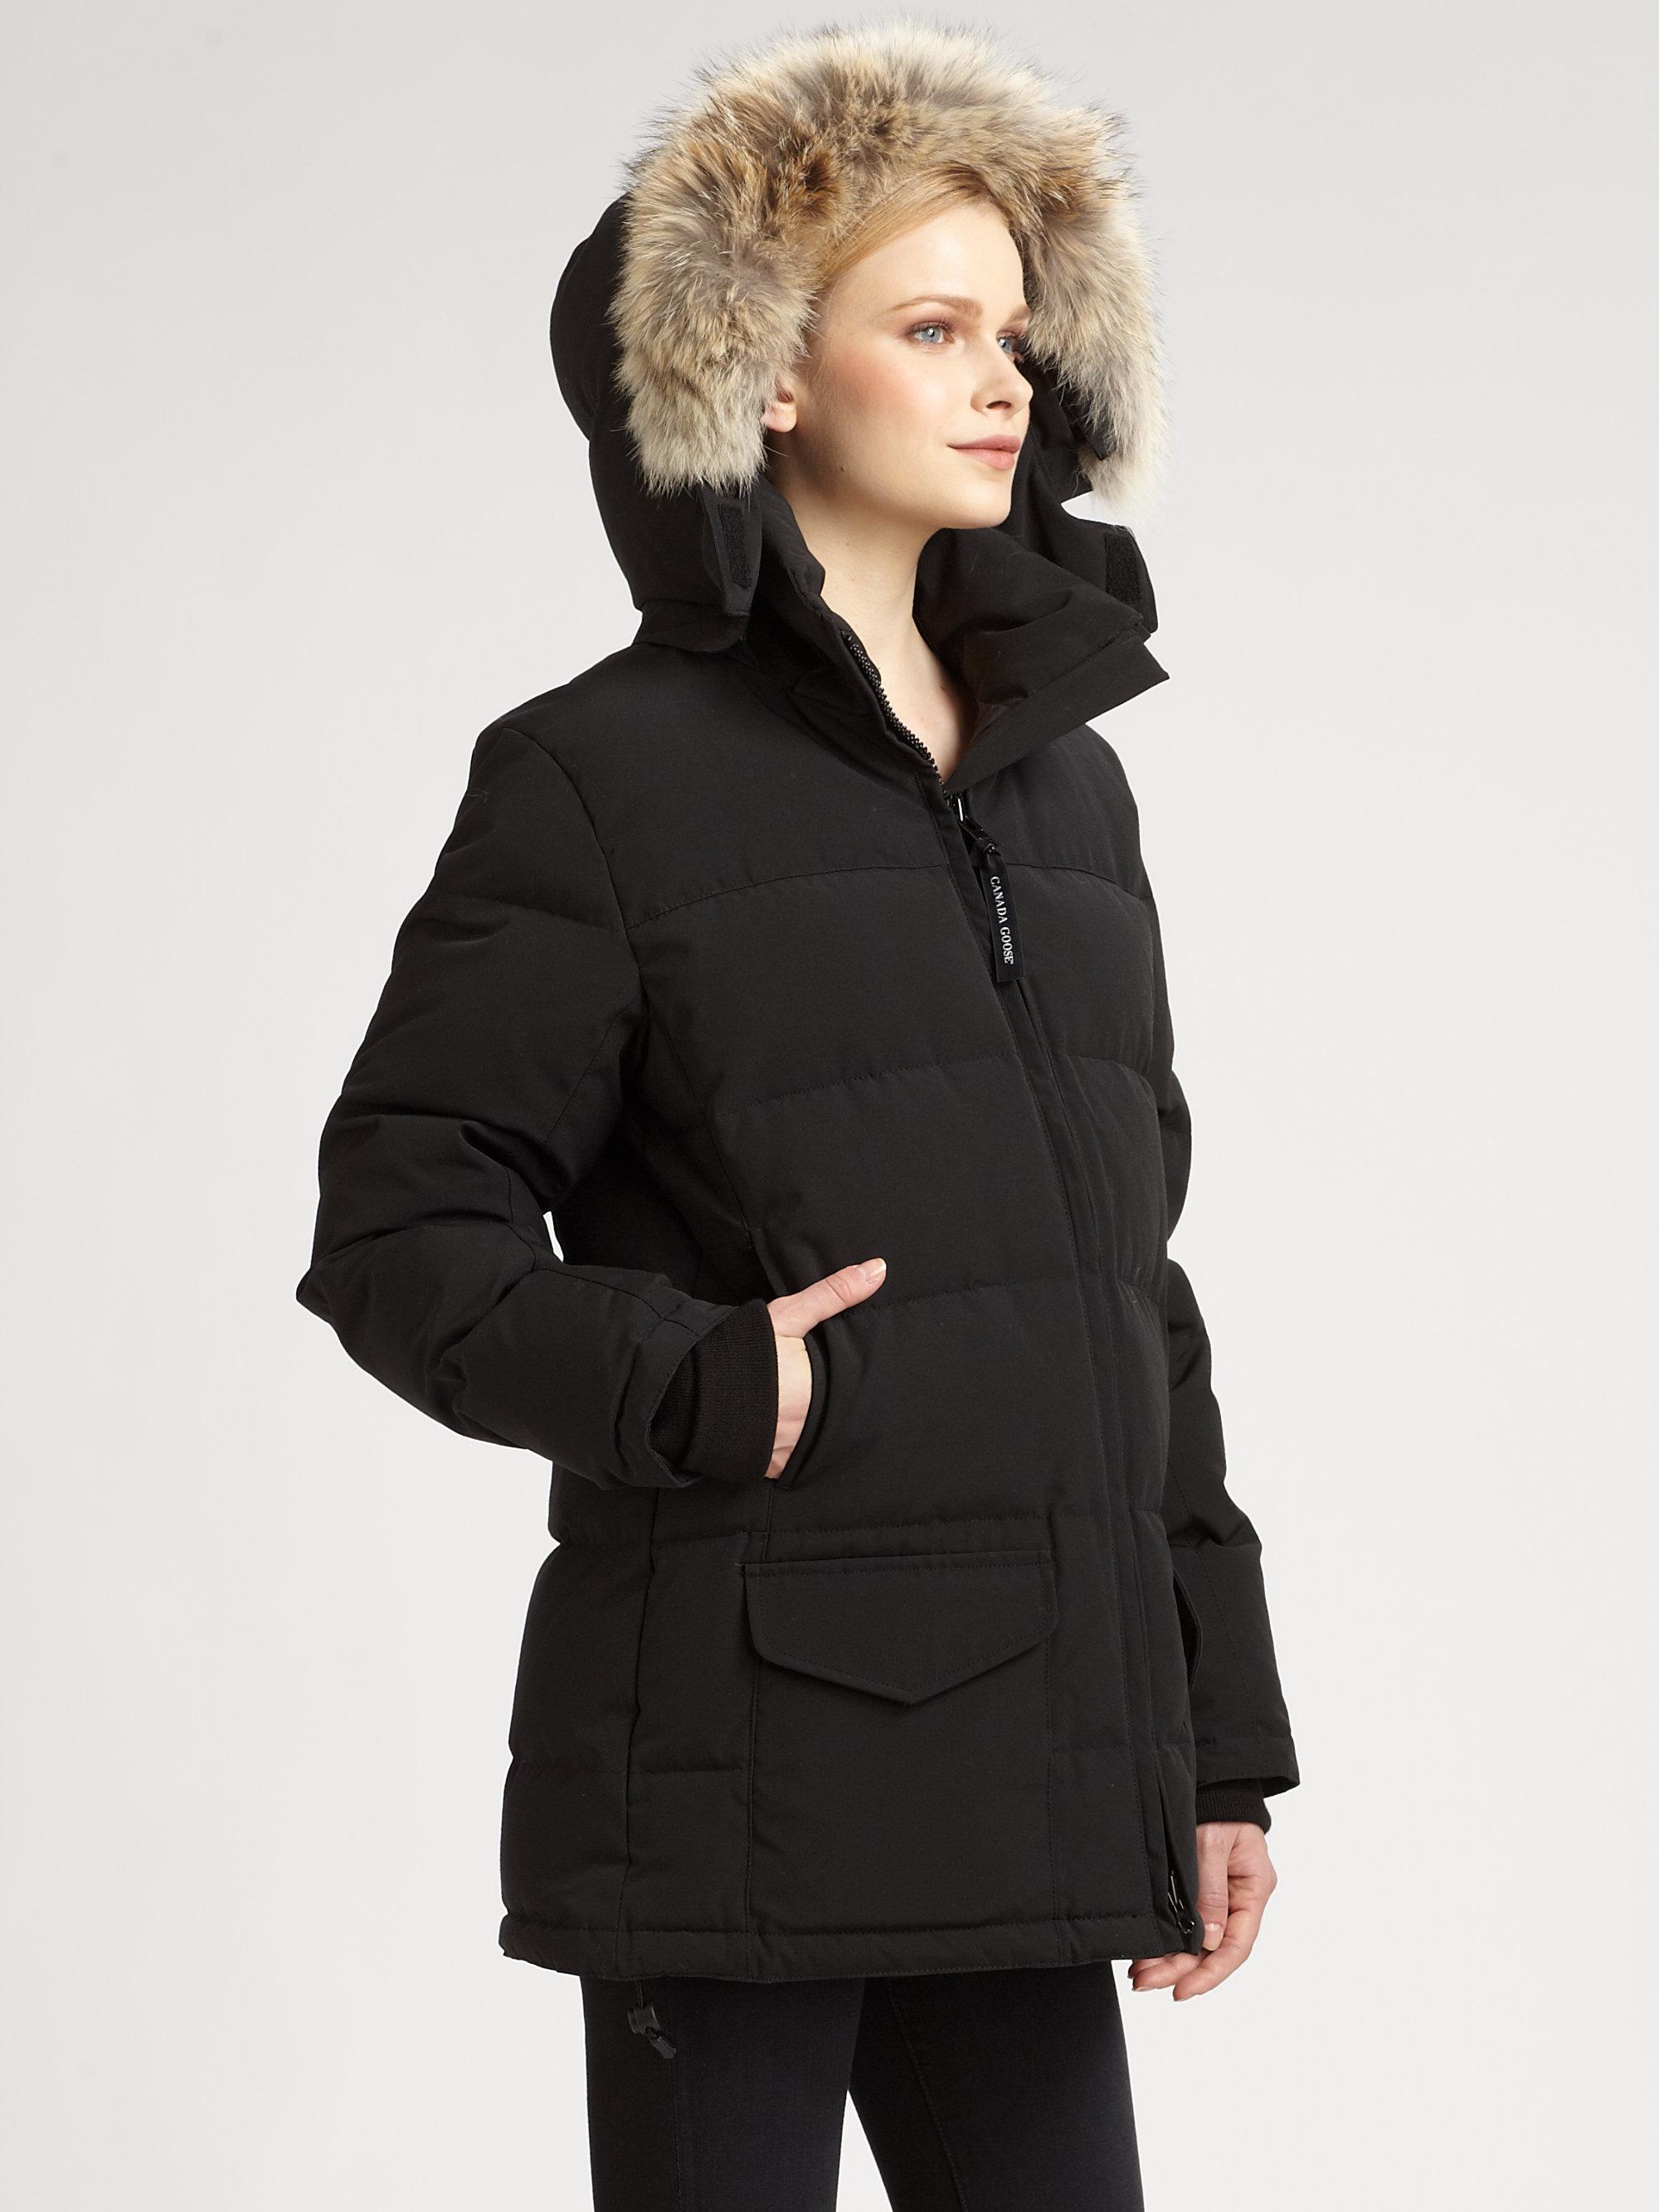 canada goose women's solaris parka jacket black